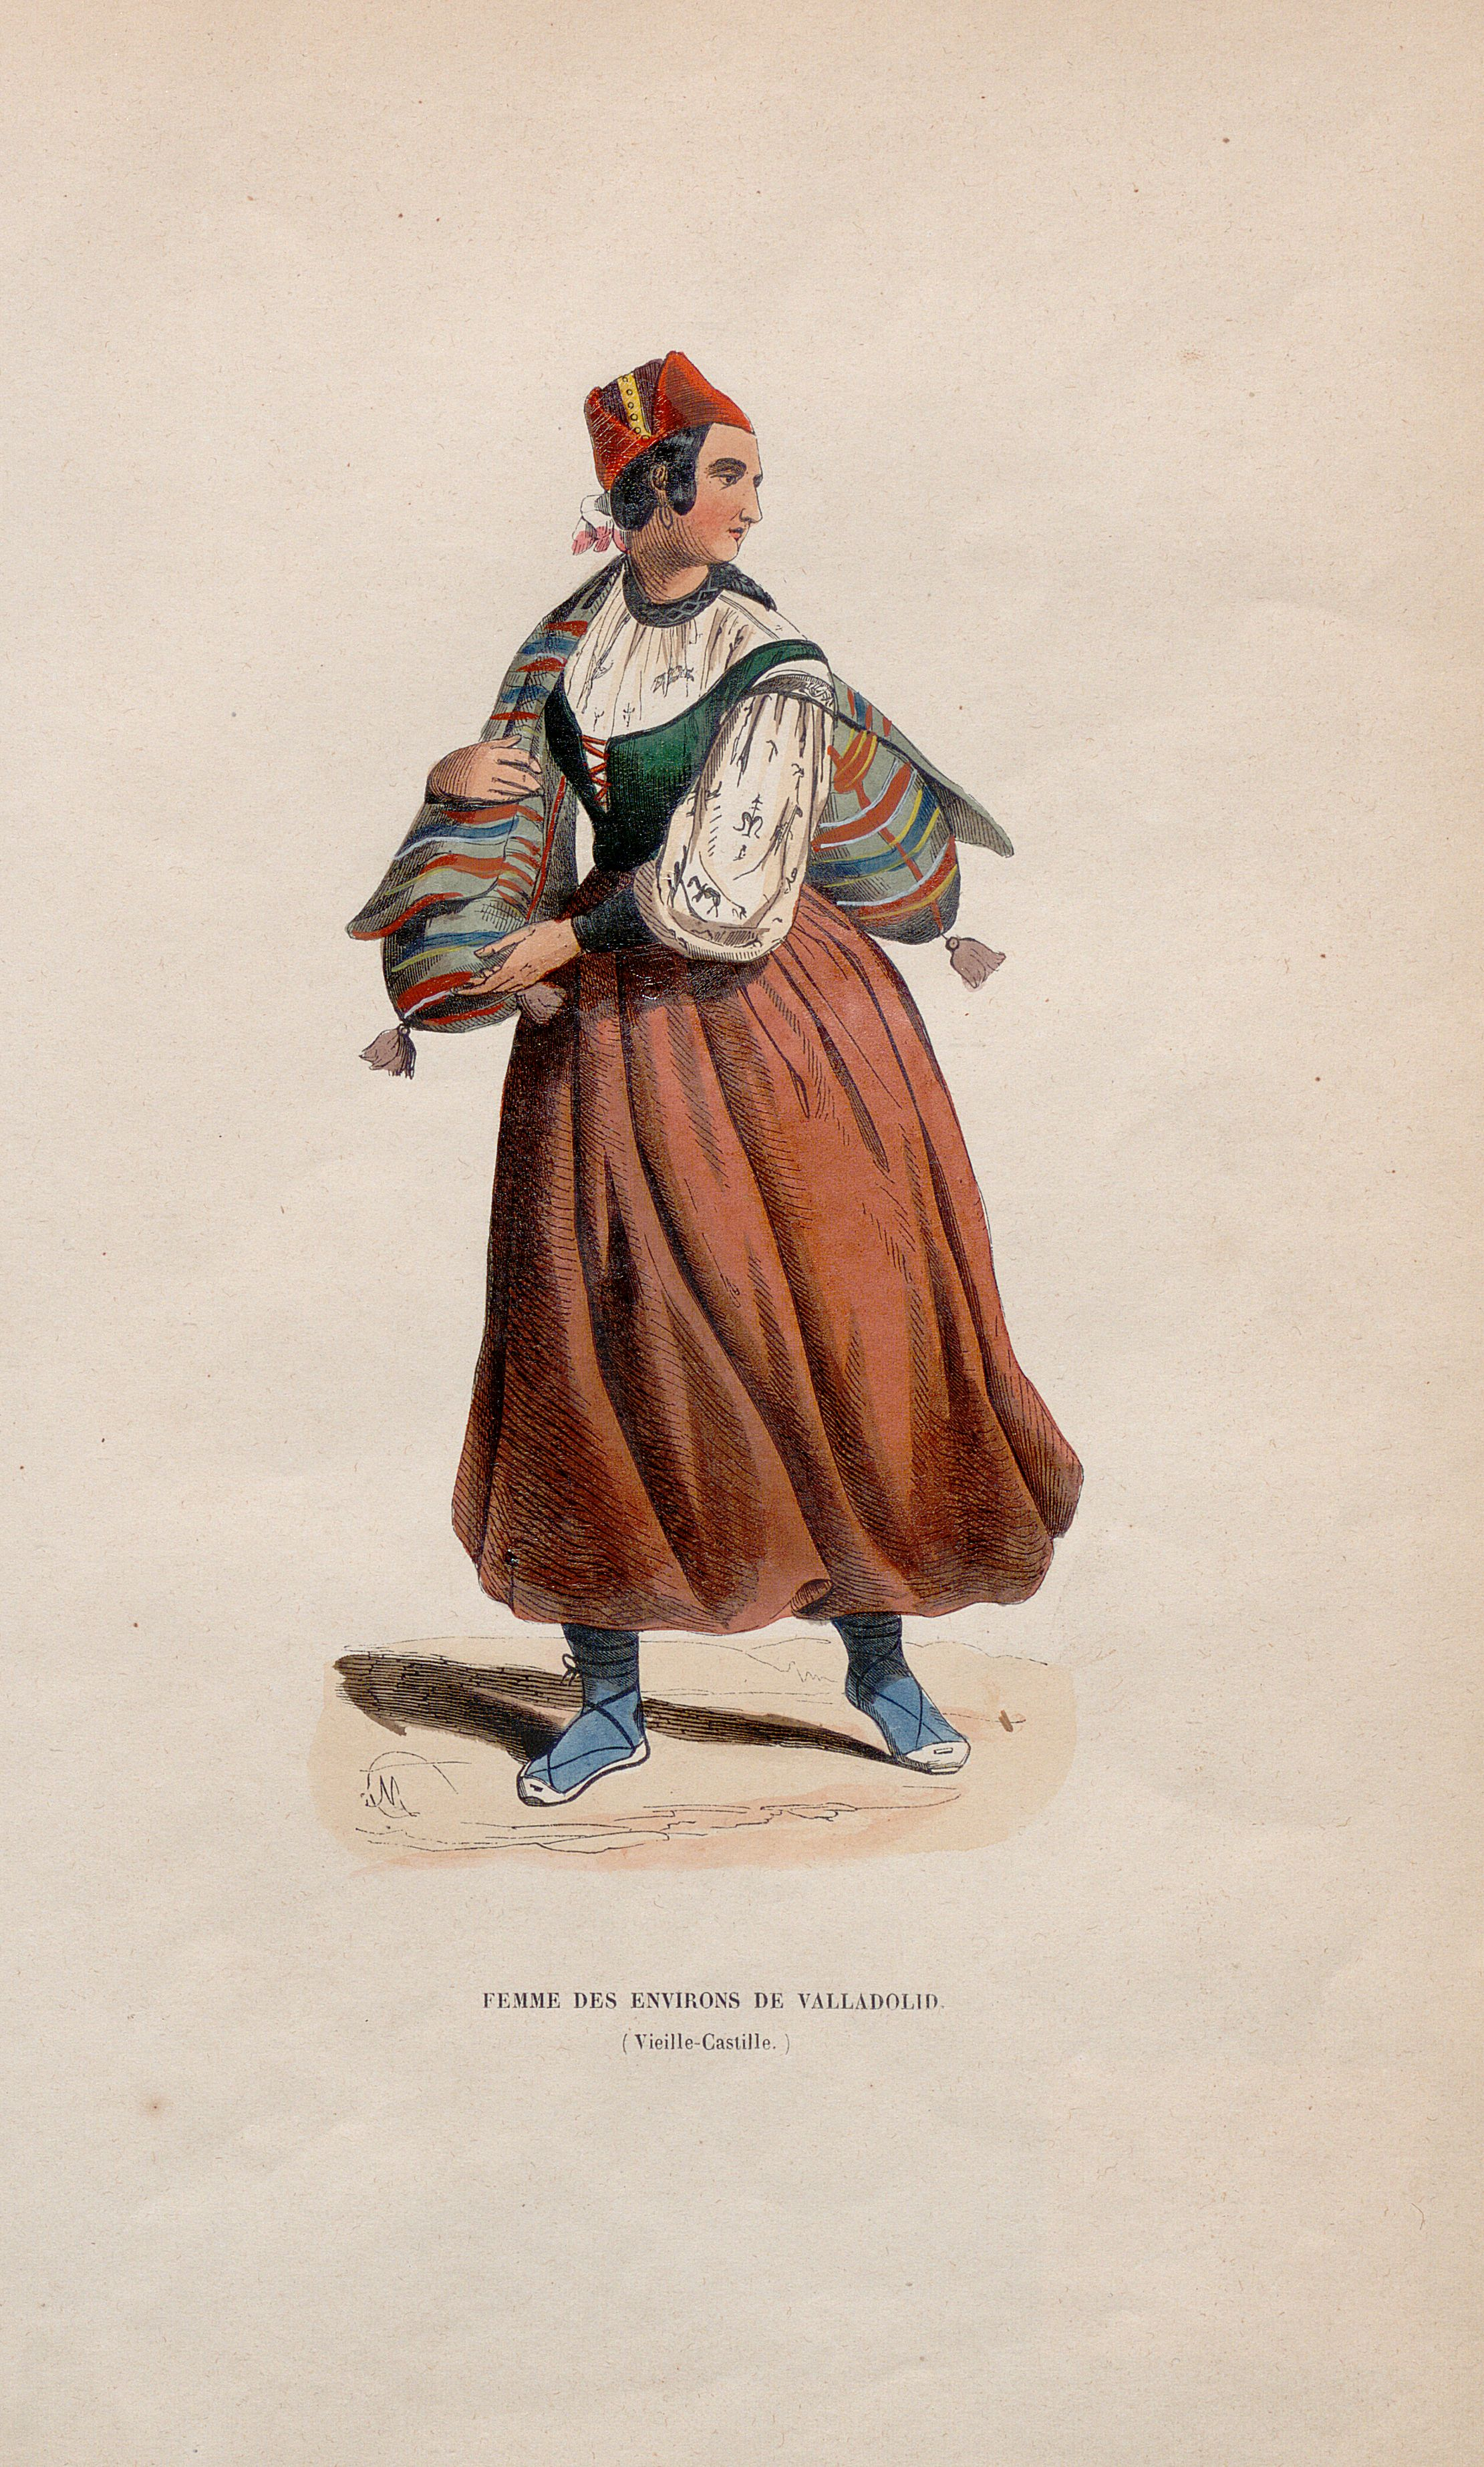 Femme des environs de Valladolid [Material gráfico] ]:(Vieille-Castille)